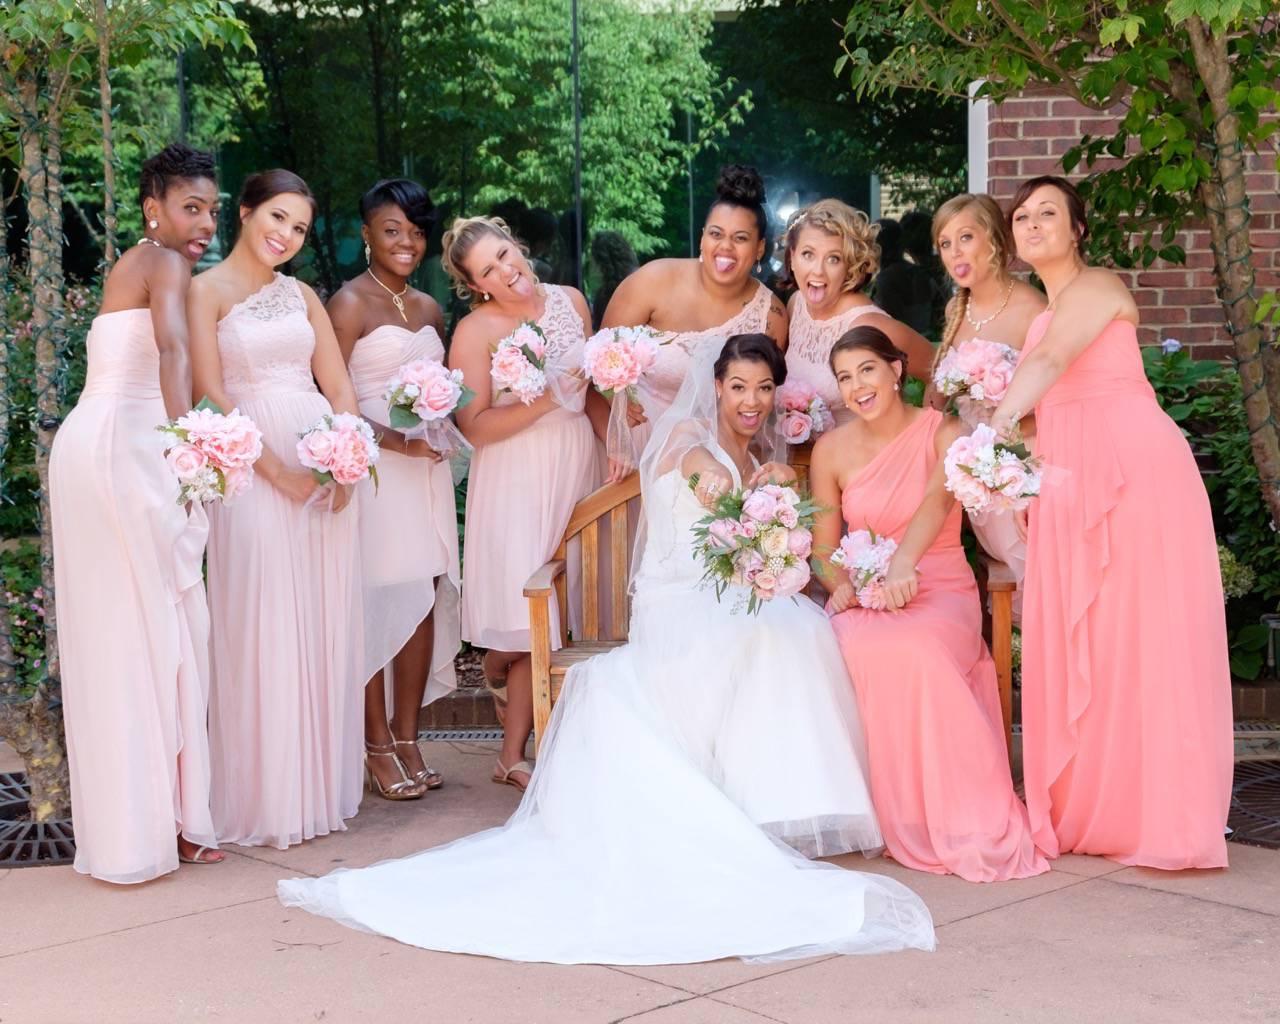 charles mack wedding photo